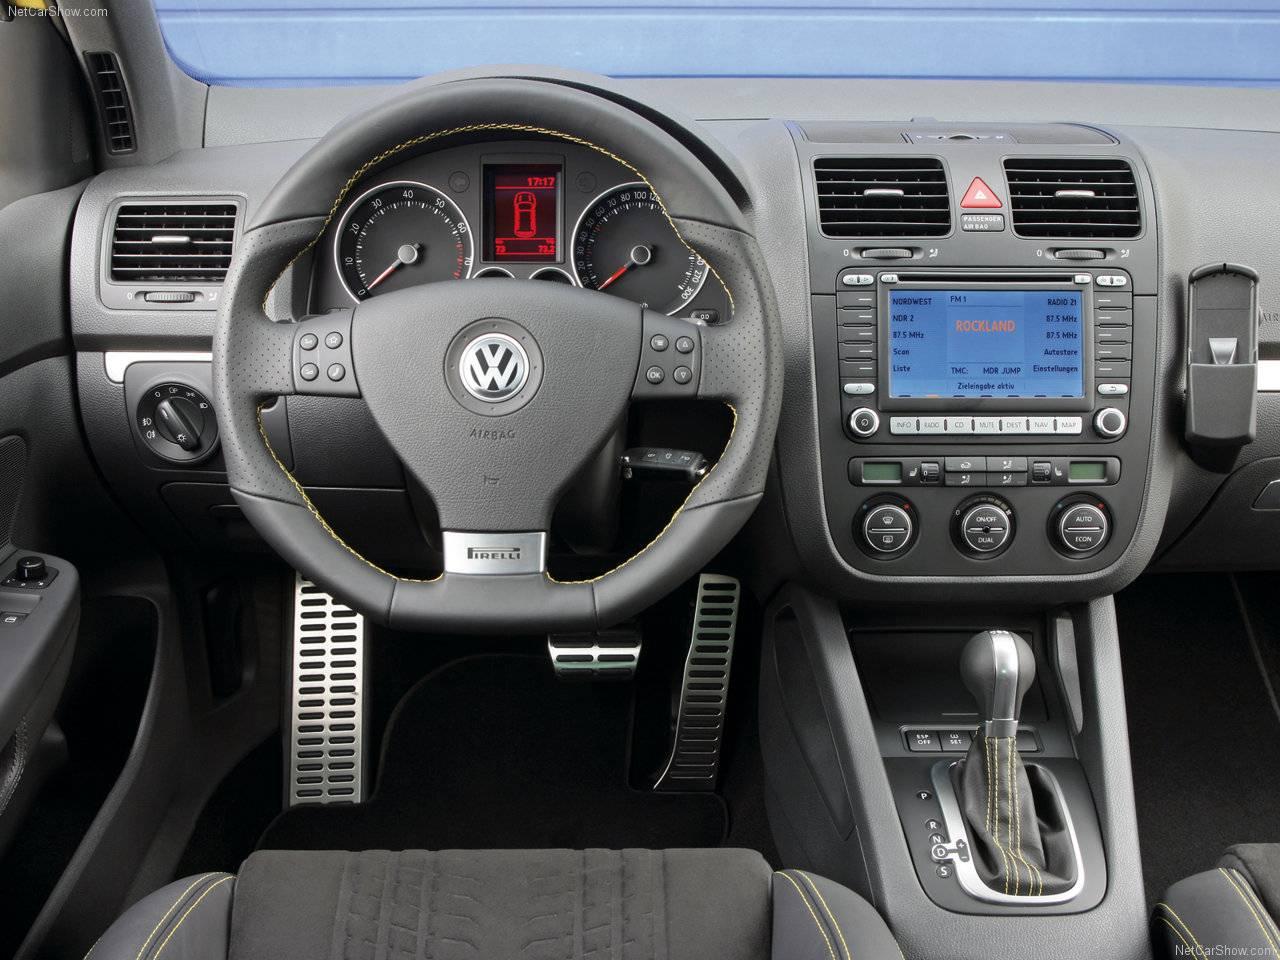 2007 Volkswagen Golf GTI